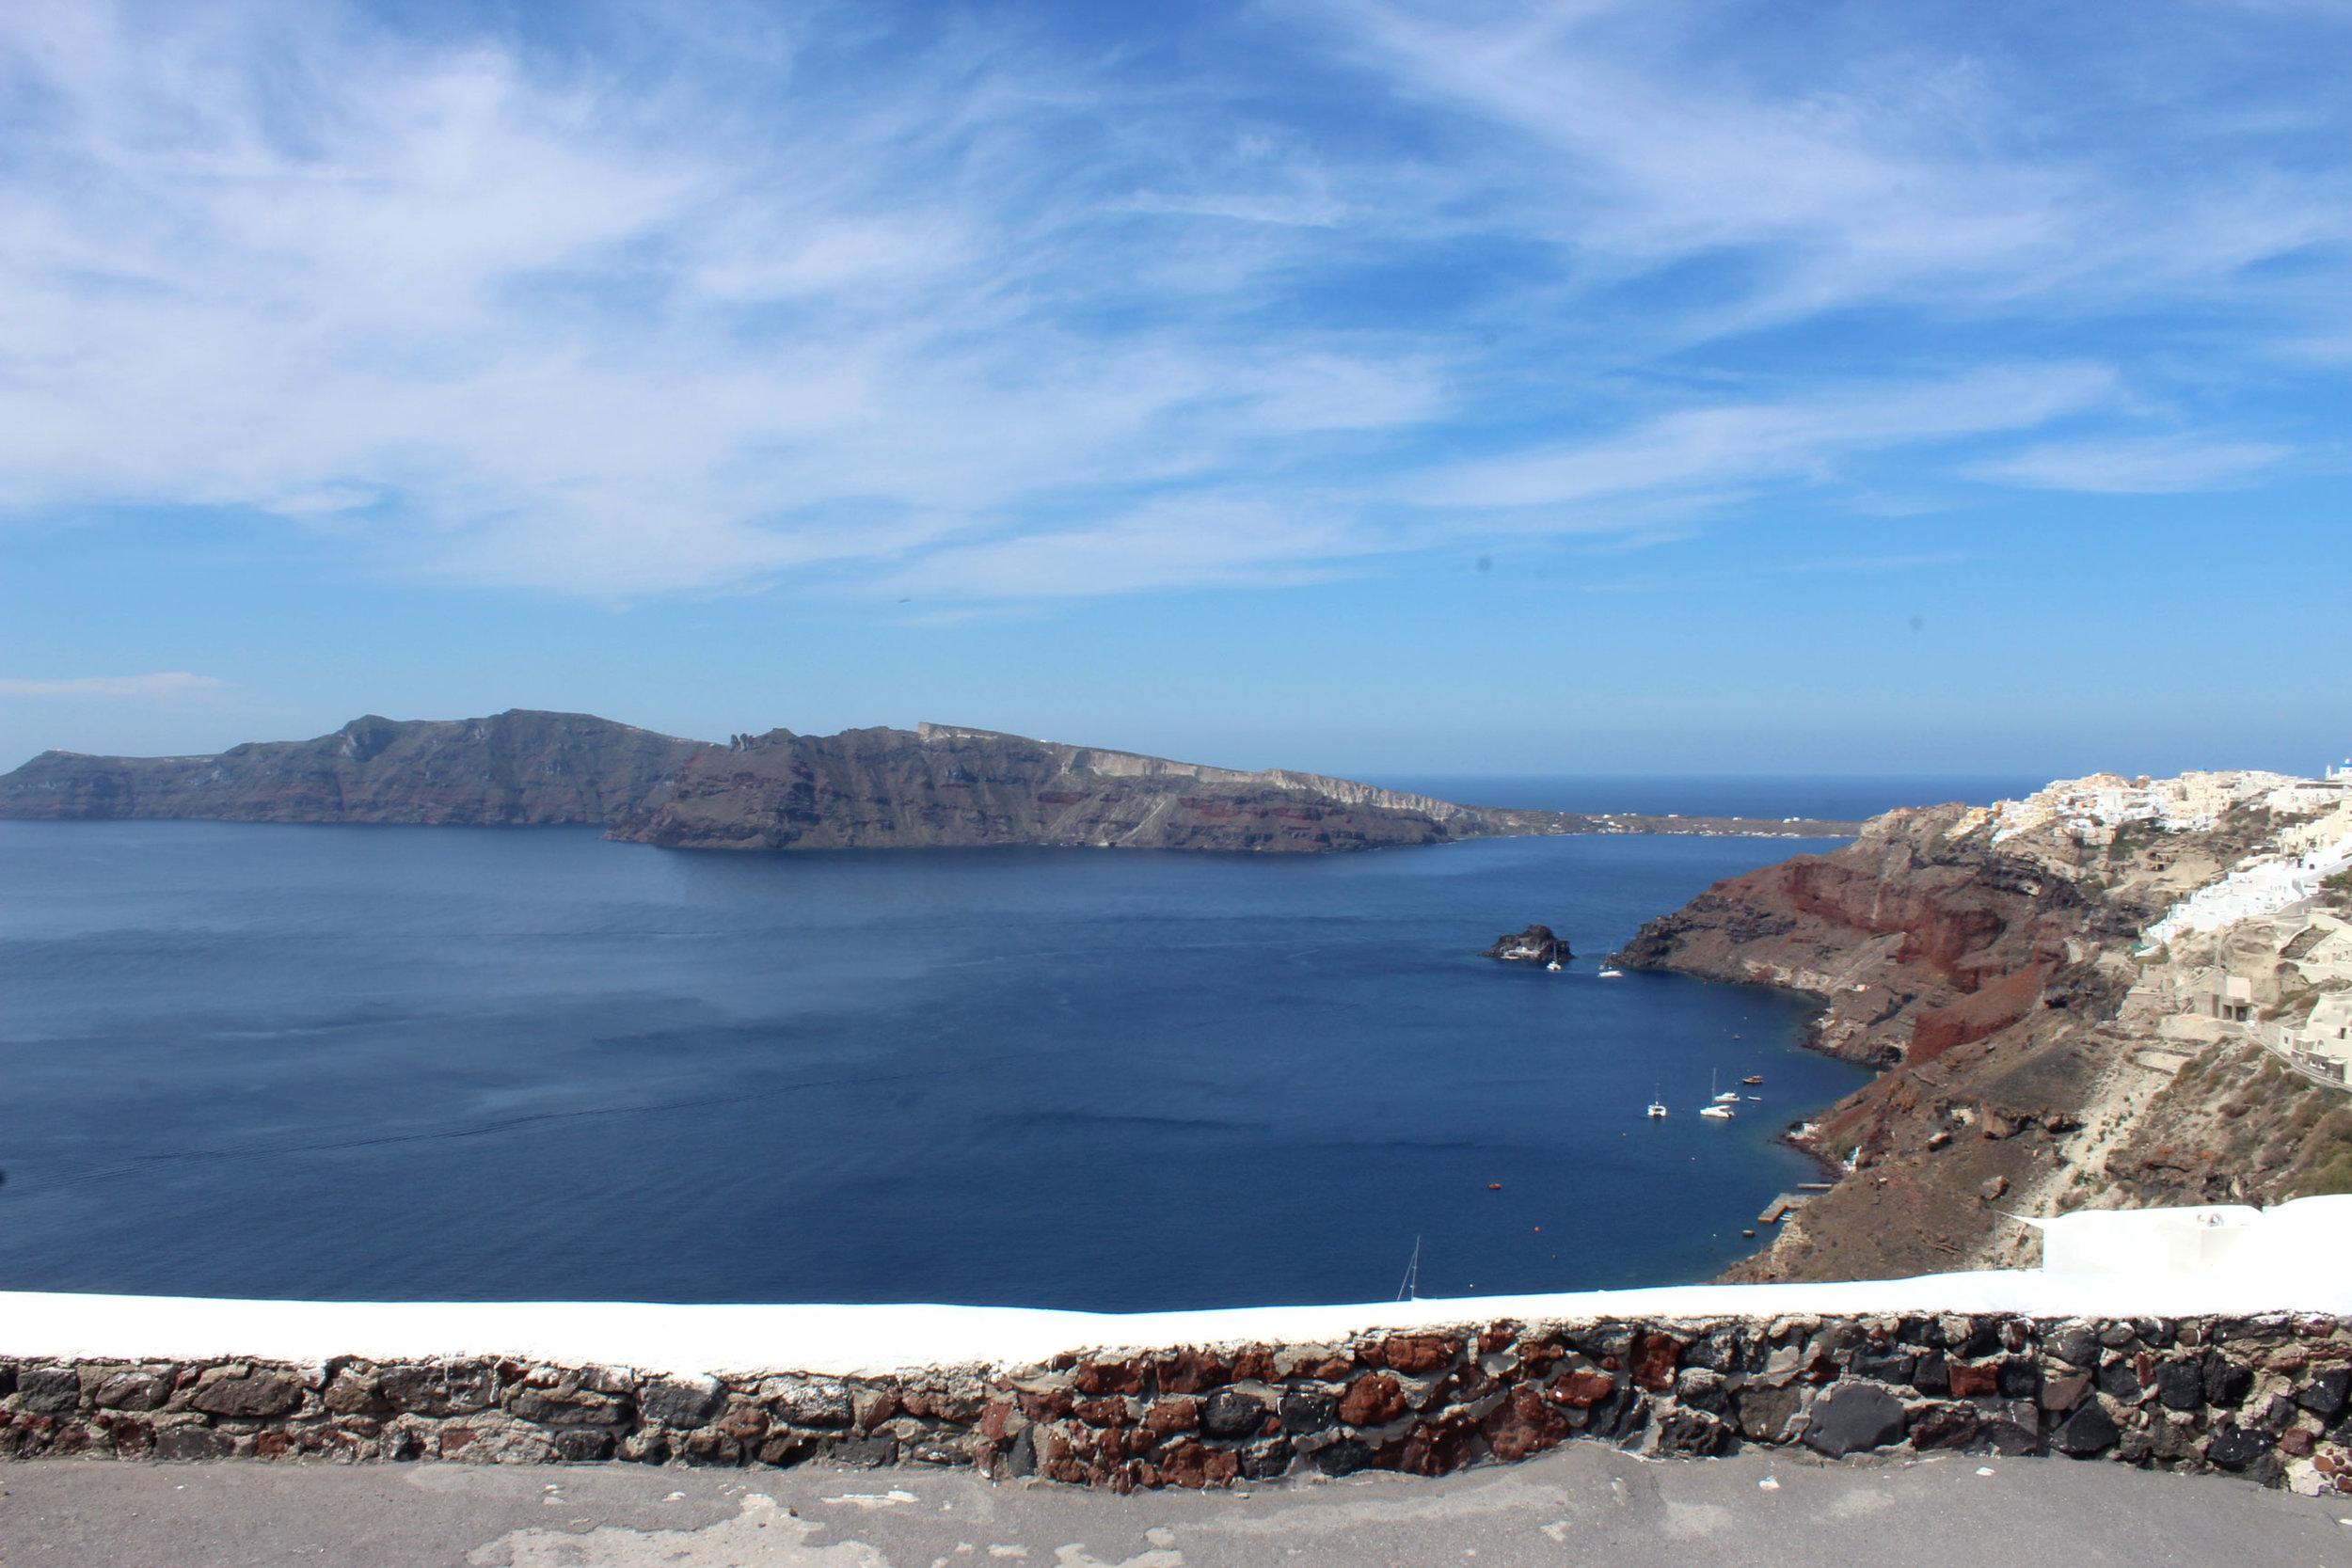 Deep blue waters and skies on the island of Santorini.